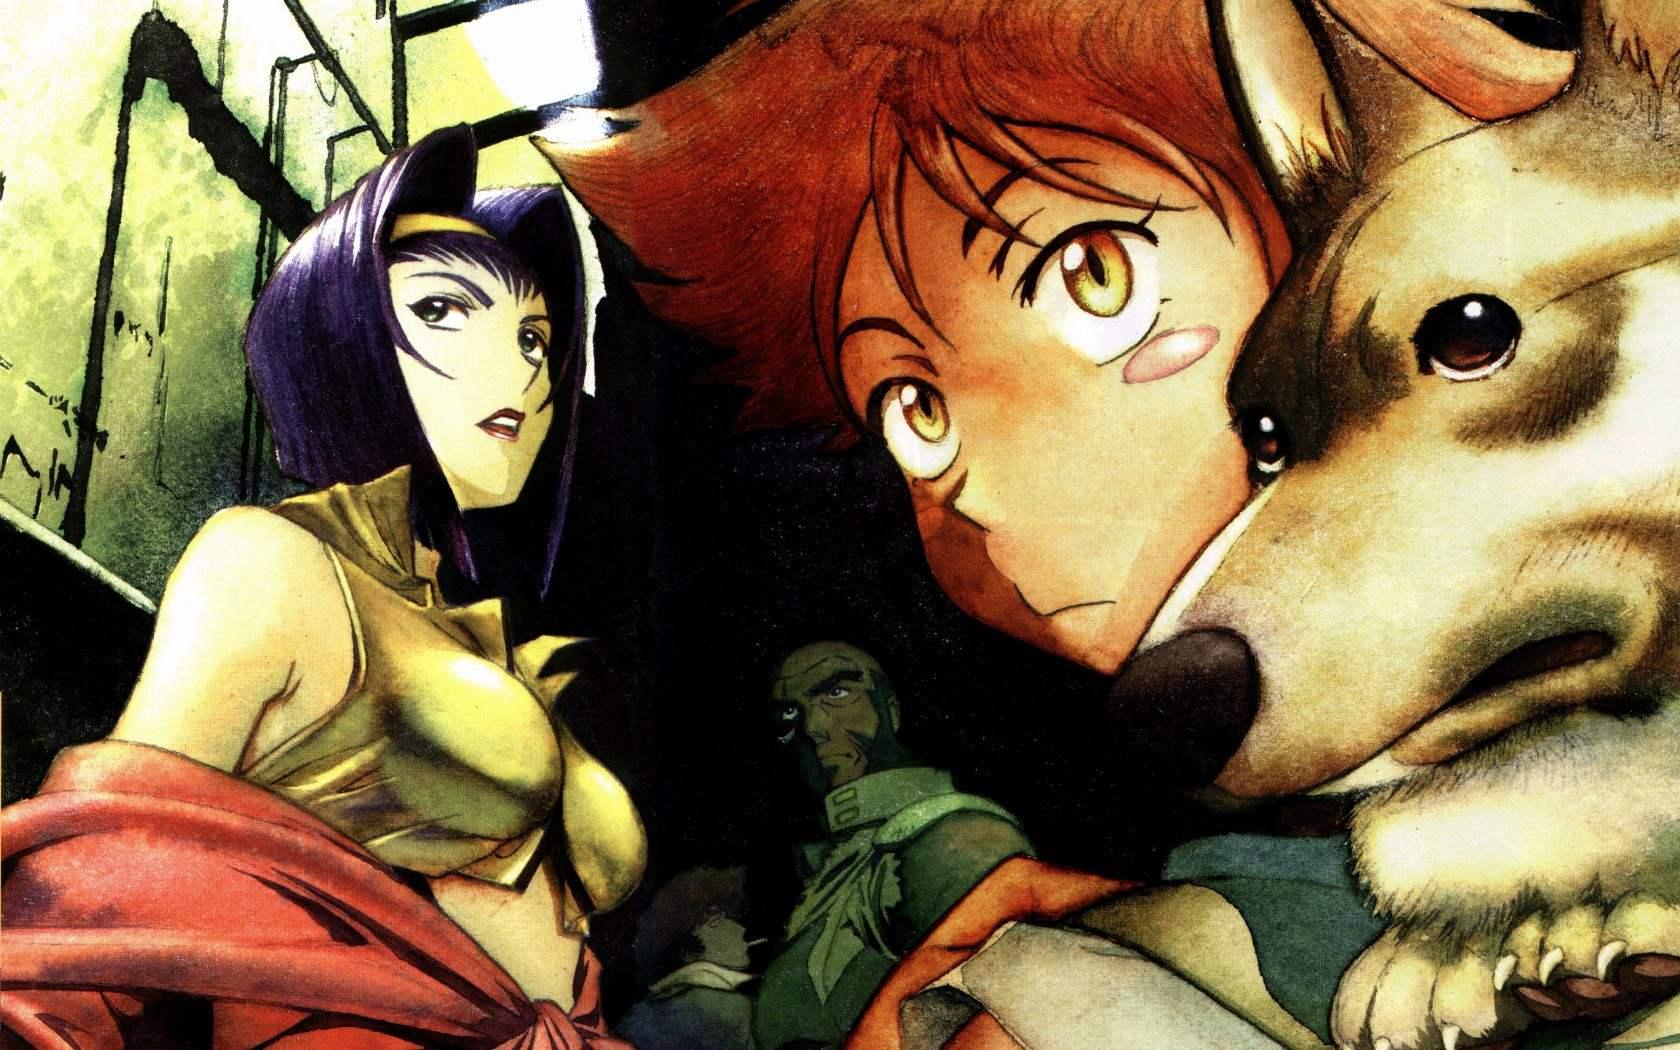 the Cowboy Bebop anime wallpaper titled Cowboy Bebop Group 3 1680x1050